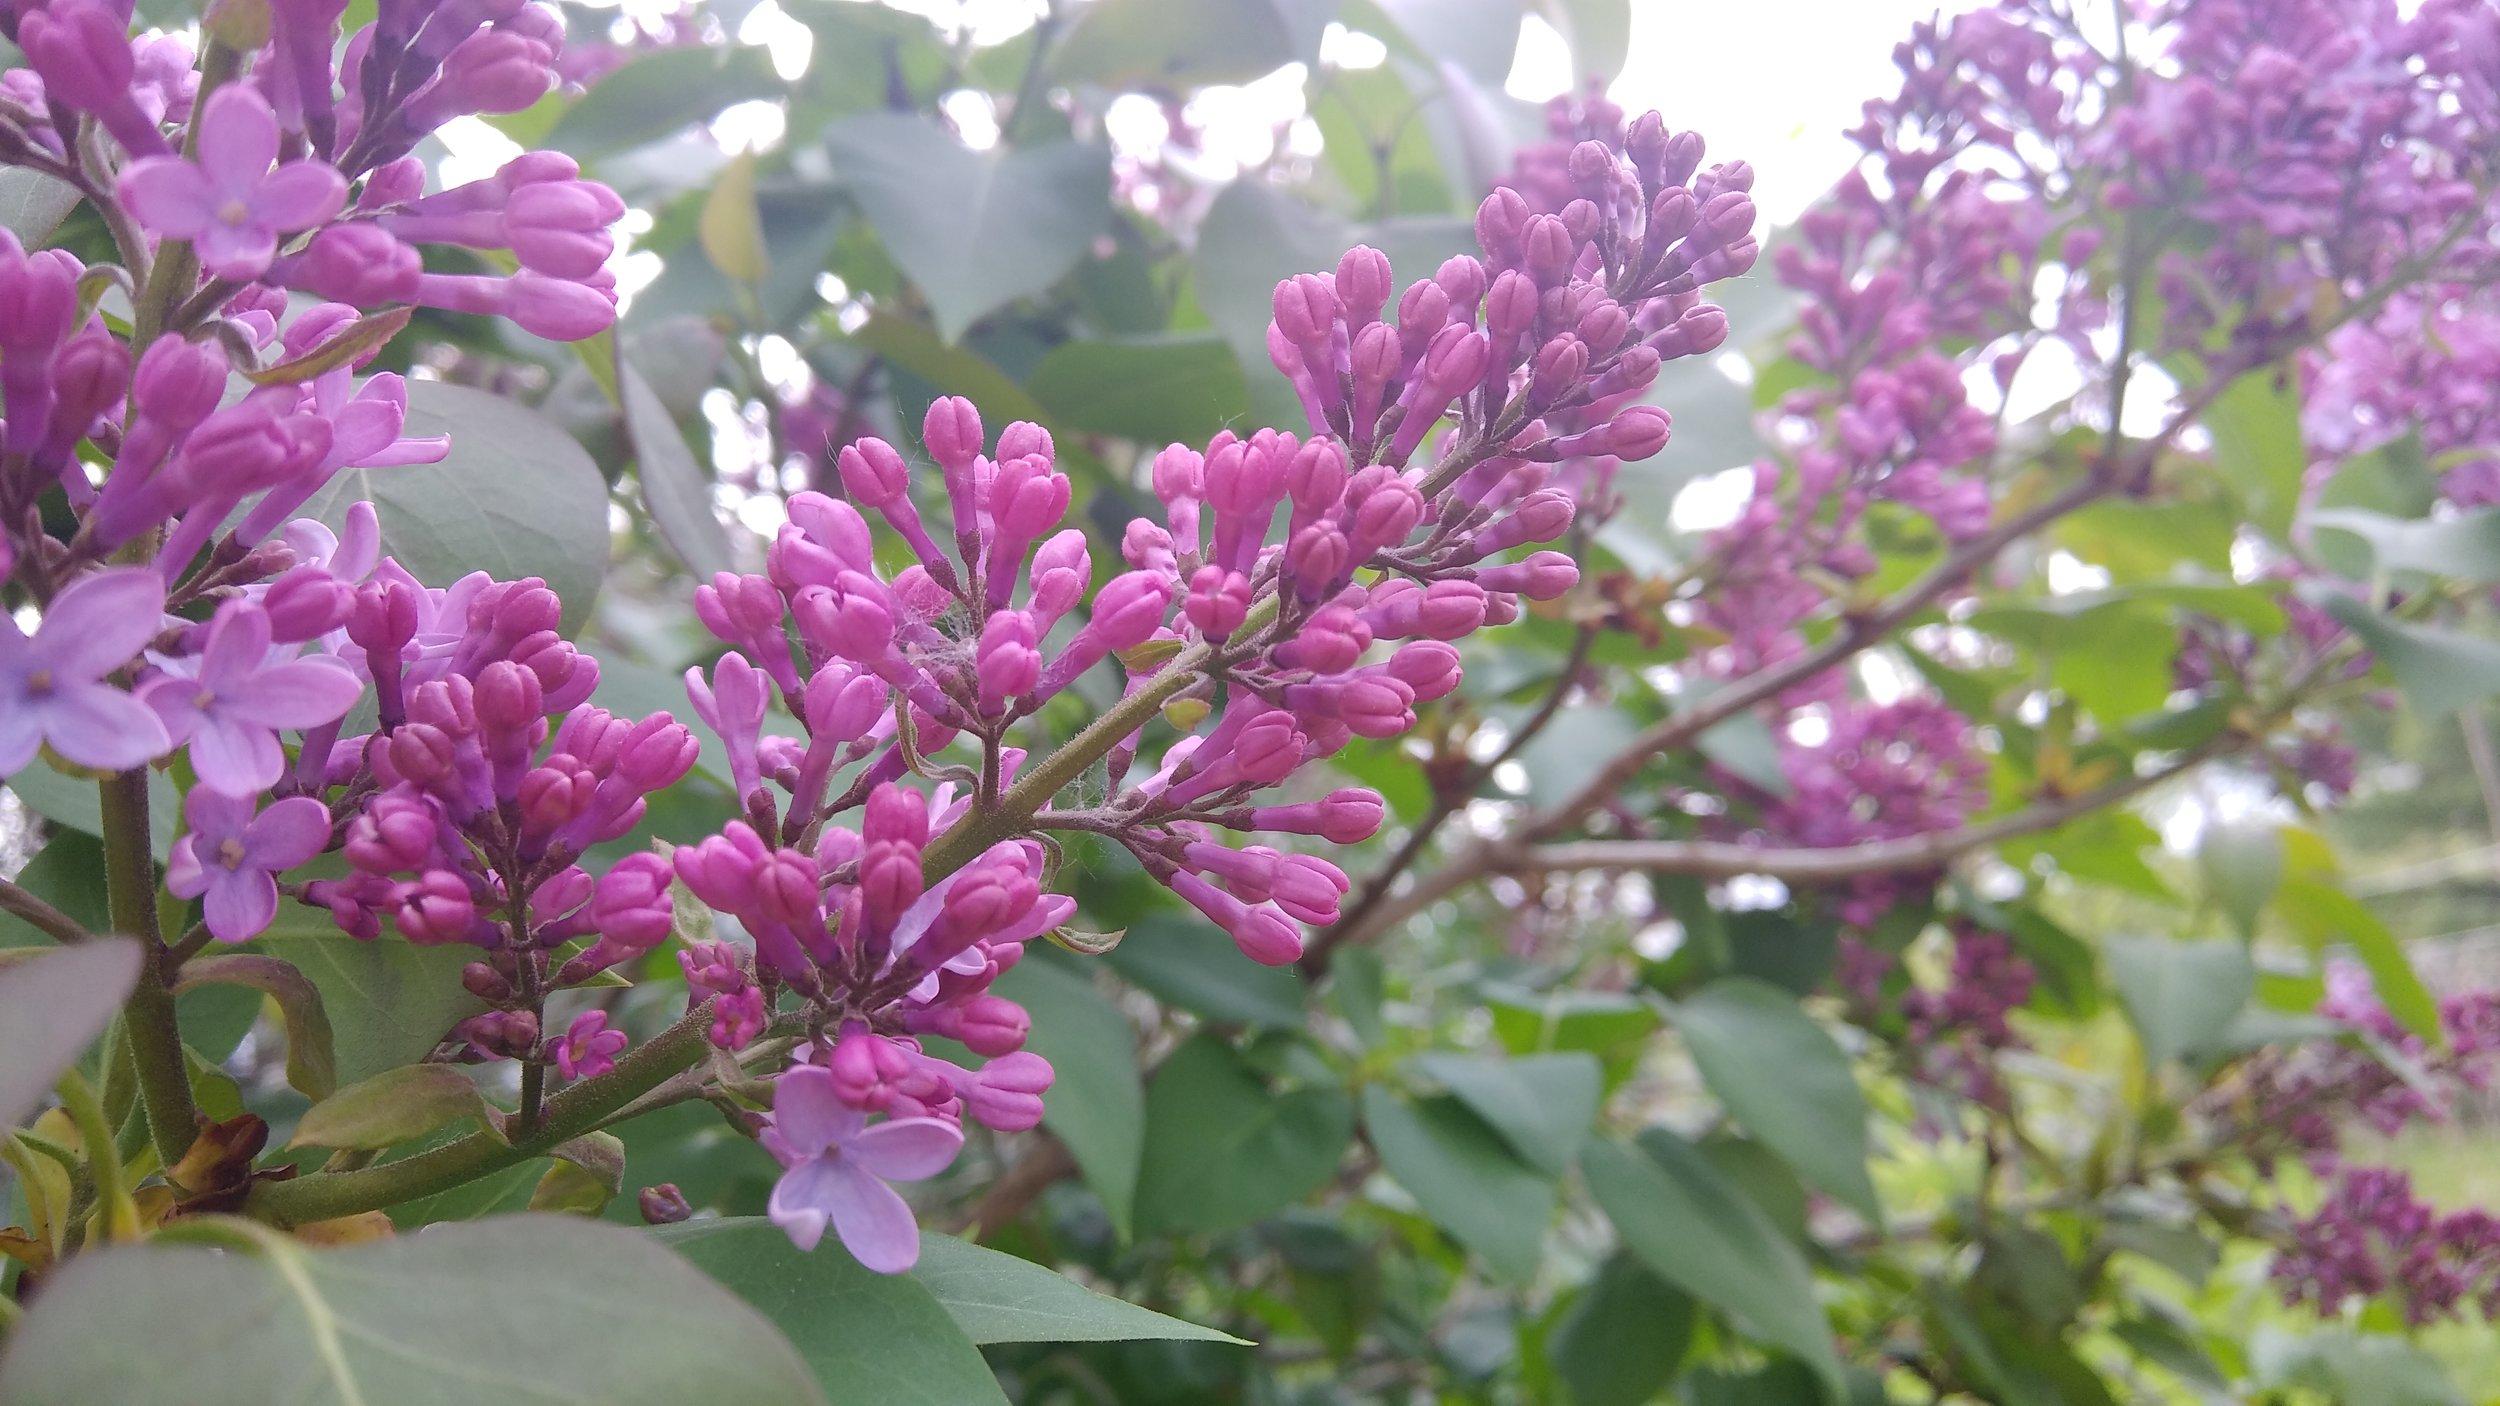 lilac bloom may 2019